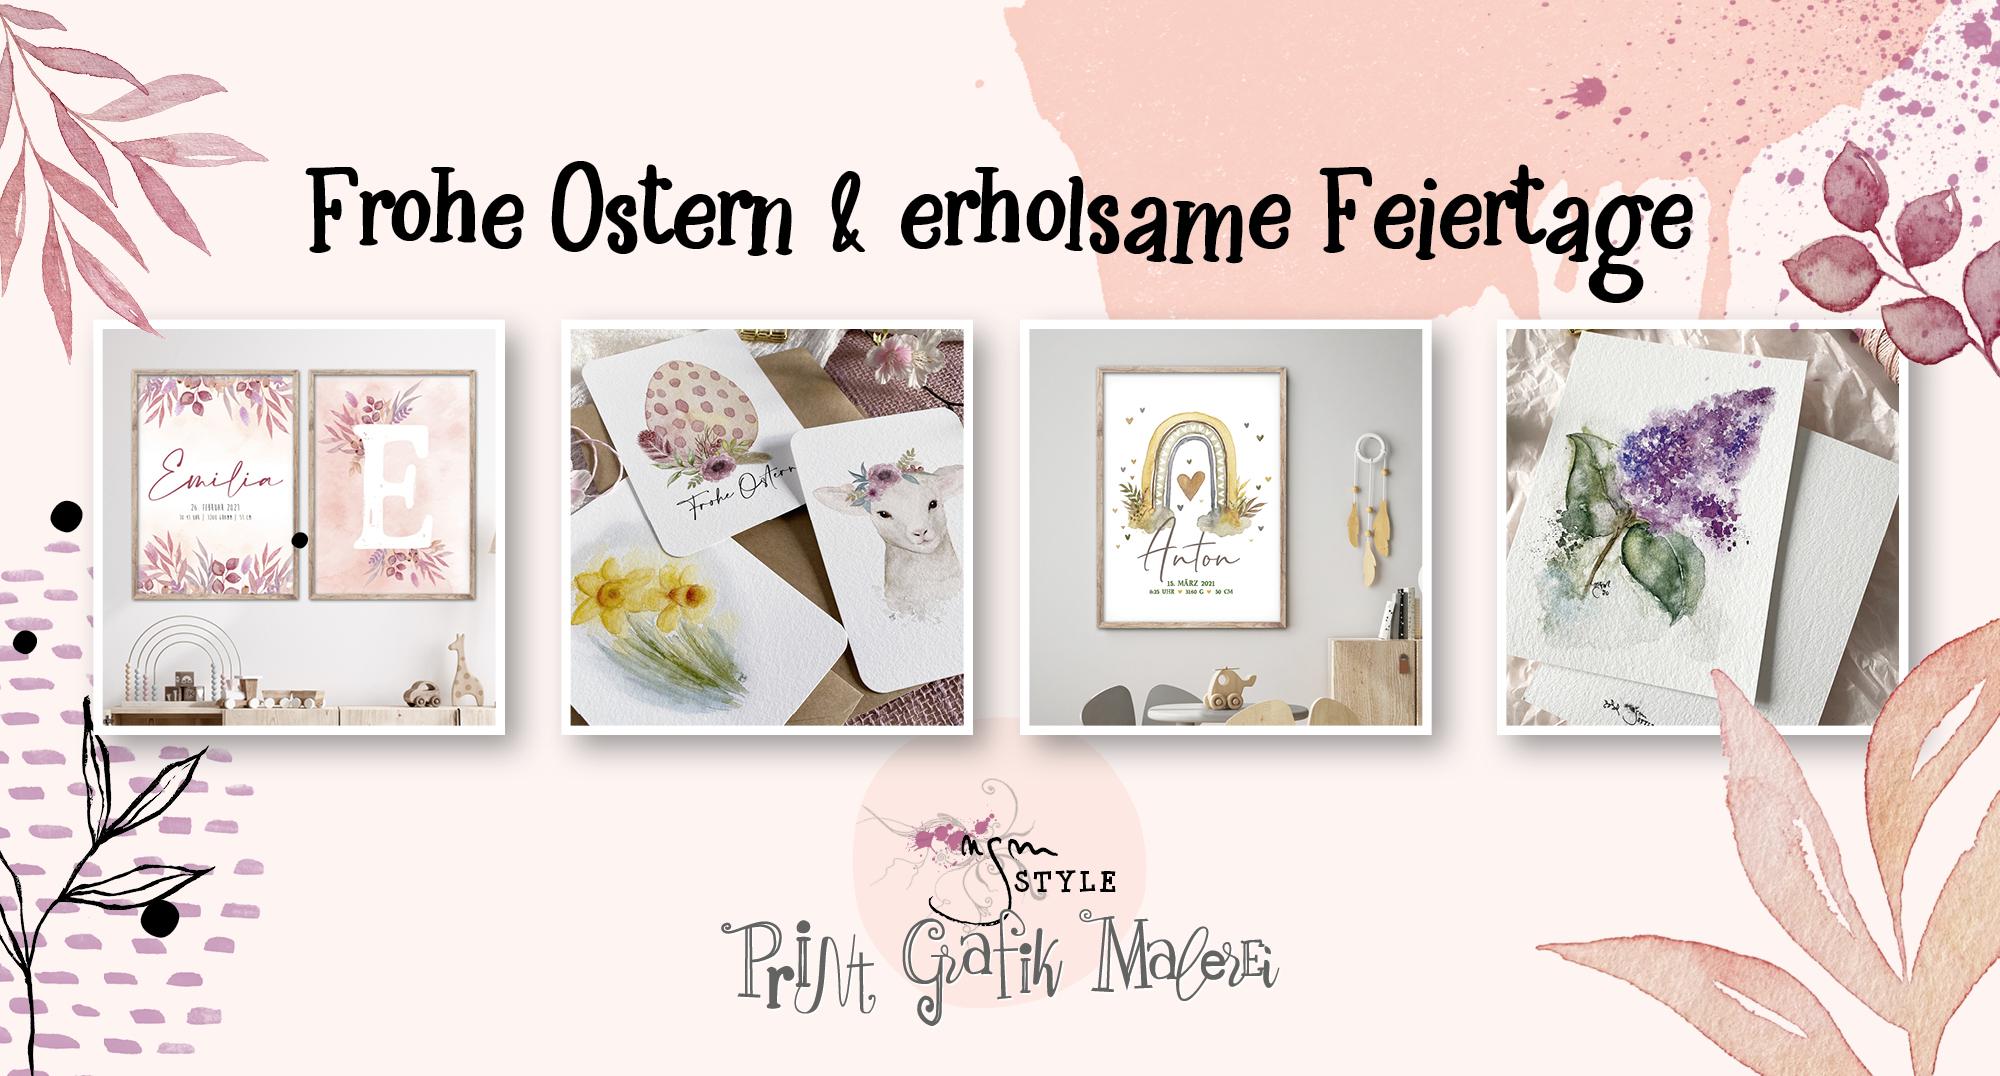 Frohe Ostern, Blog, ngmstyle Neuigkeiten aus dem Shop, Freebie, XL-Poster, A2, Etsy, Shop,